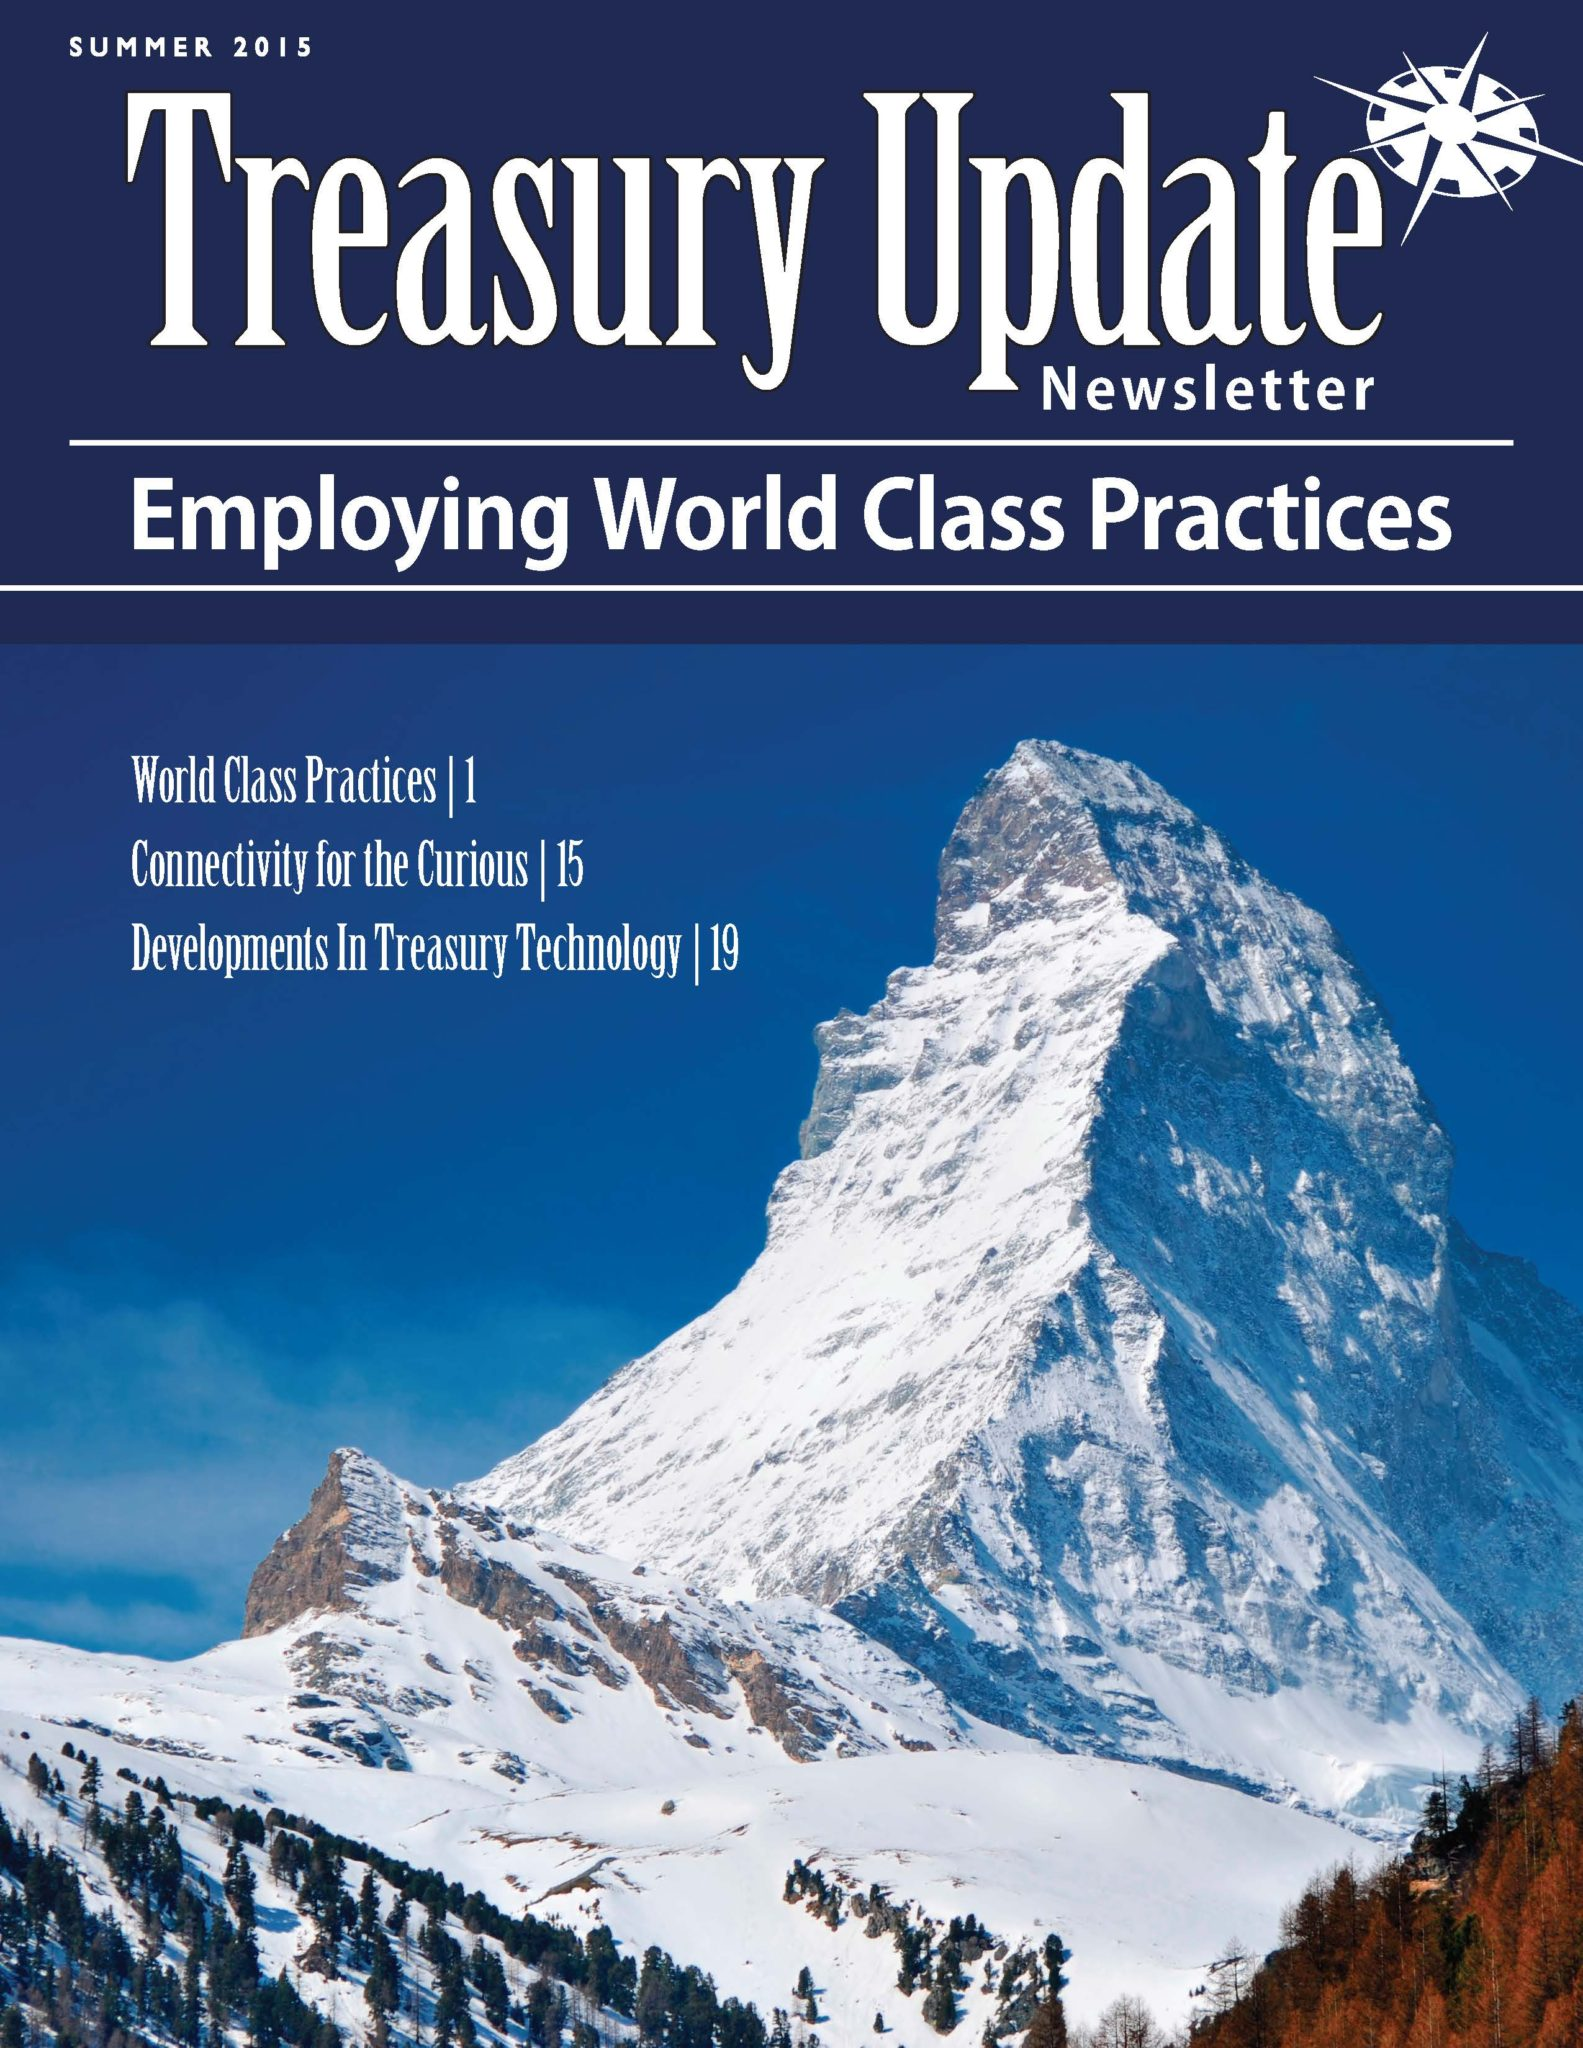 Summer 2015 Treasury Update Newsletter